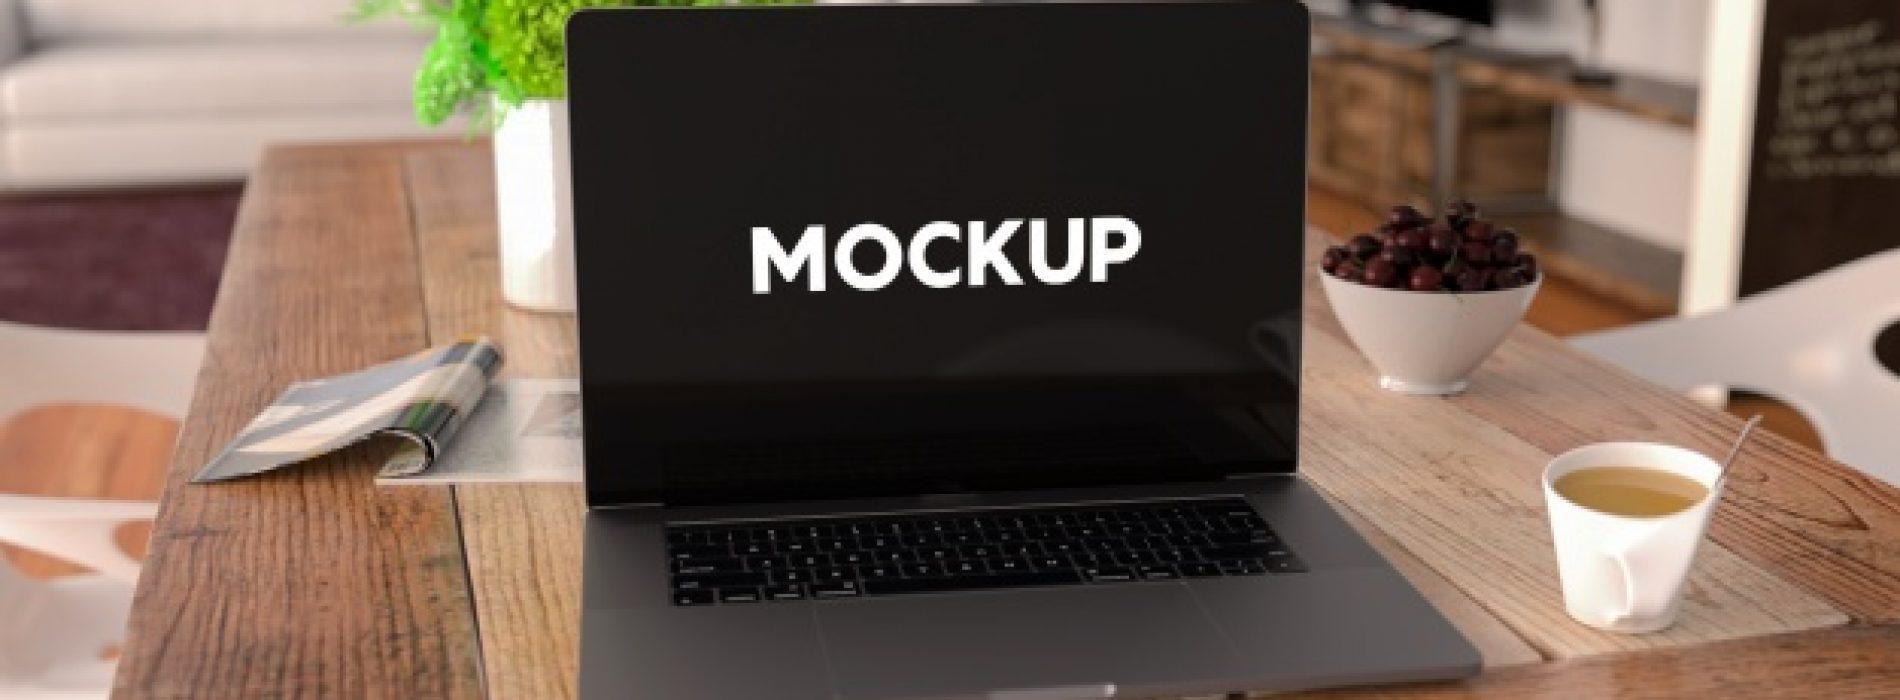 Home Office Laptop Mockup PSD